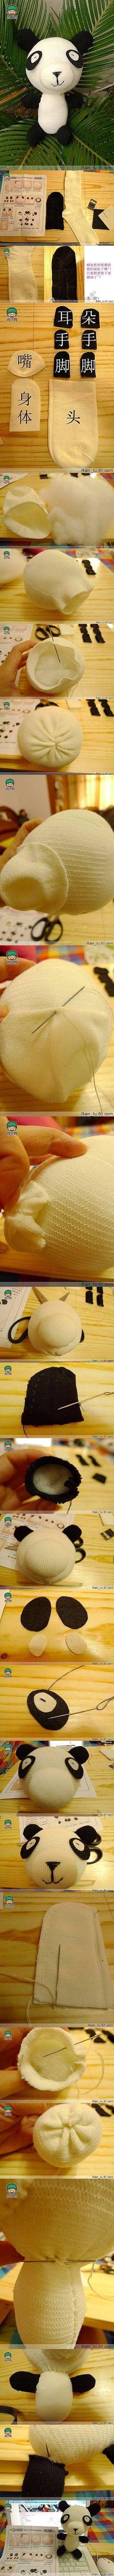 DIY Sock Panda Doll DIY Projects   UsefulDIY.com Follow Us on Facebook ==> http://www.facebook.com/UsefulDiy